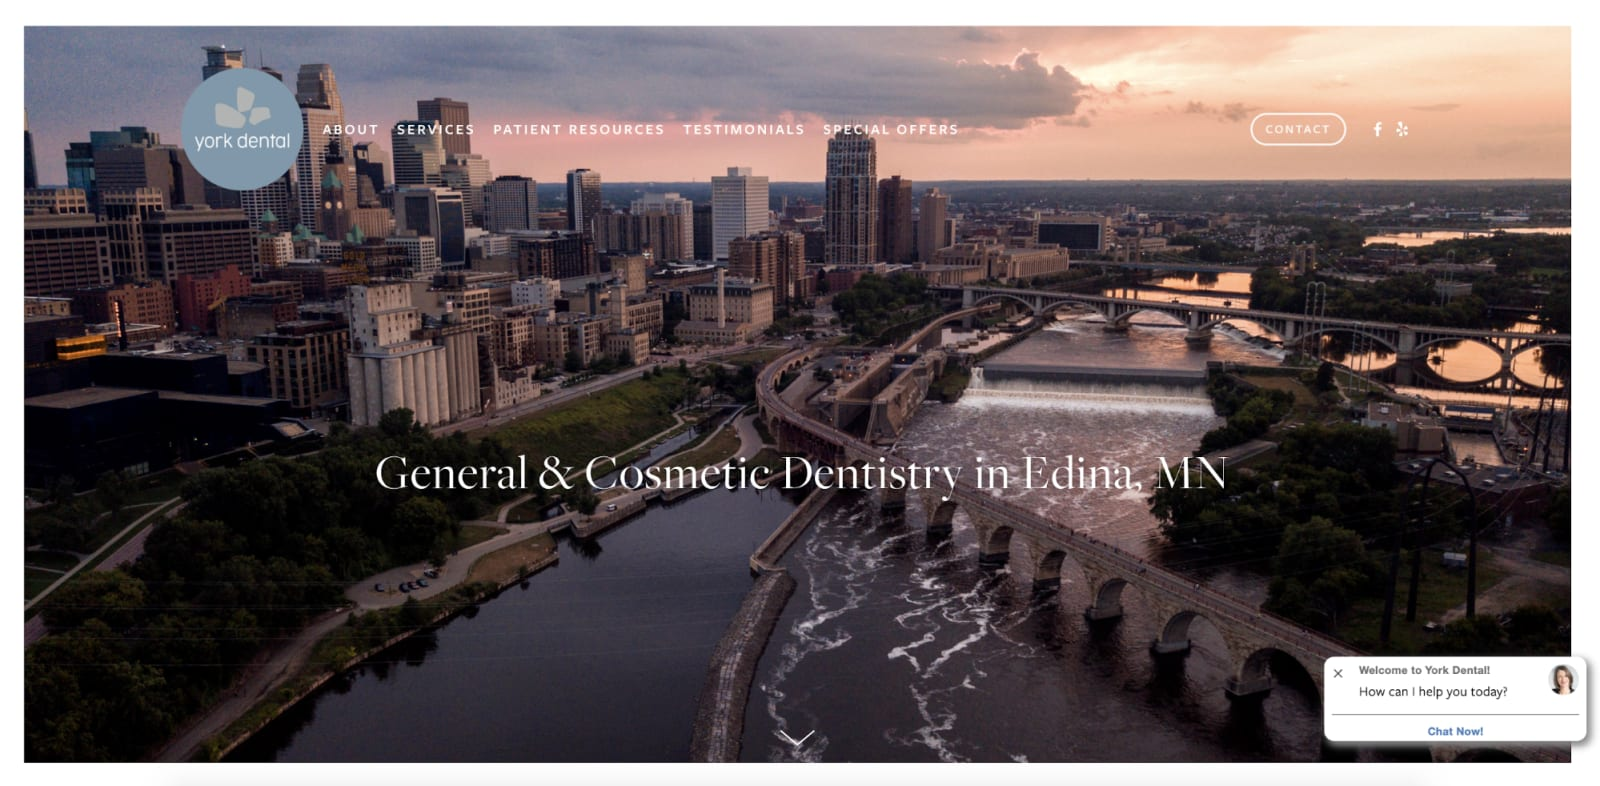 York Dental website